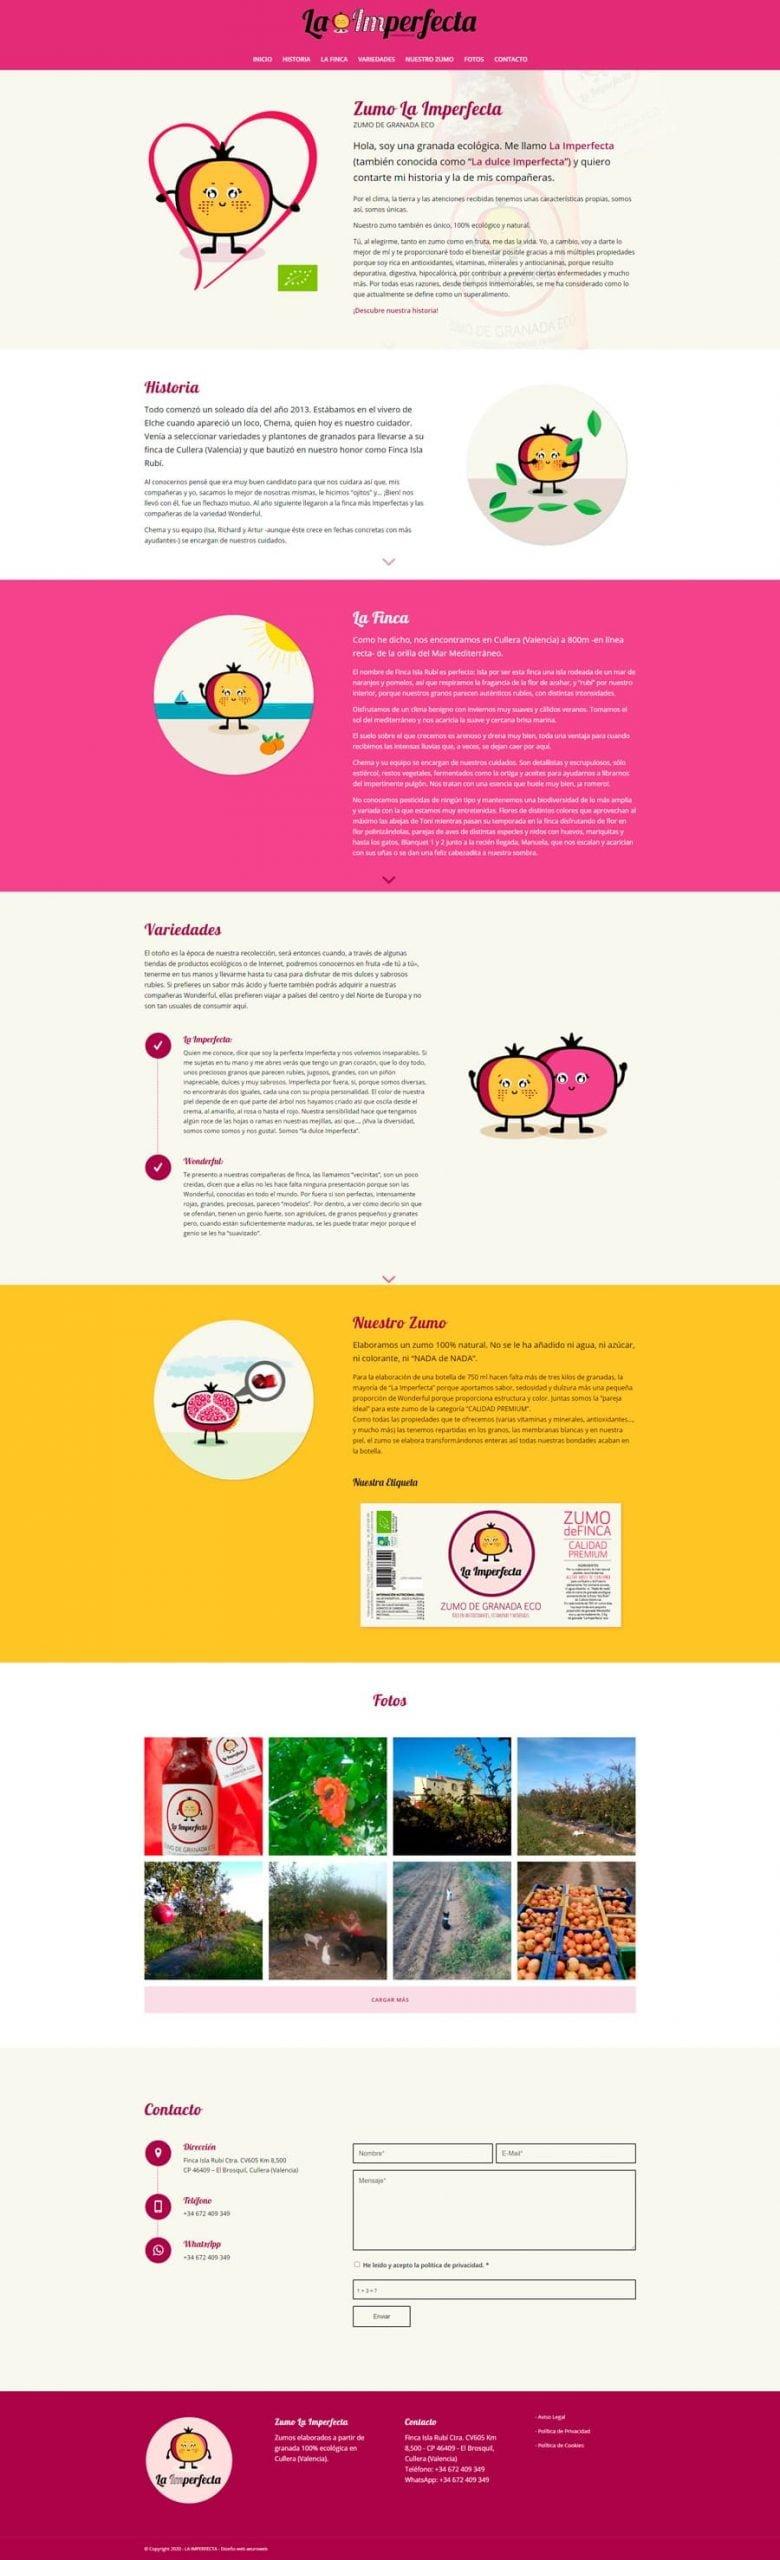 diseño web la imperfecta